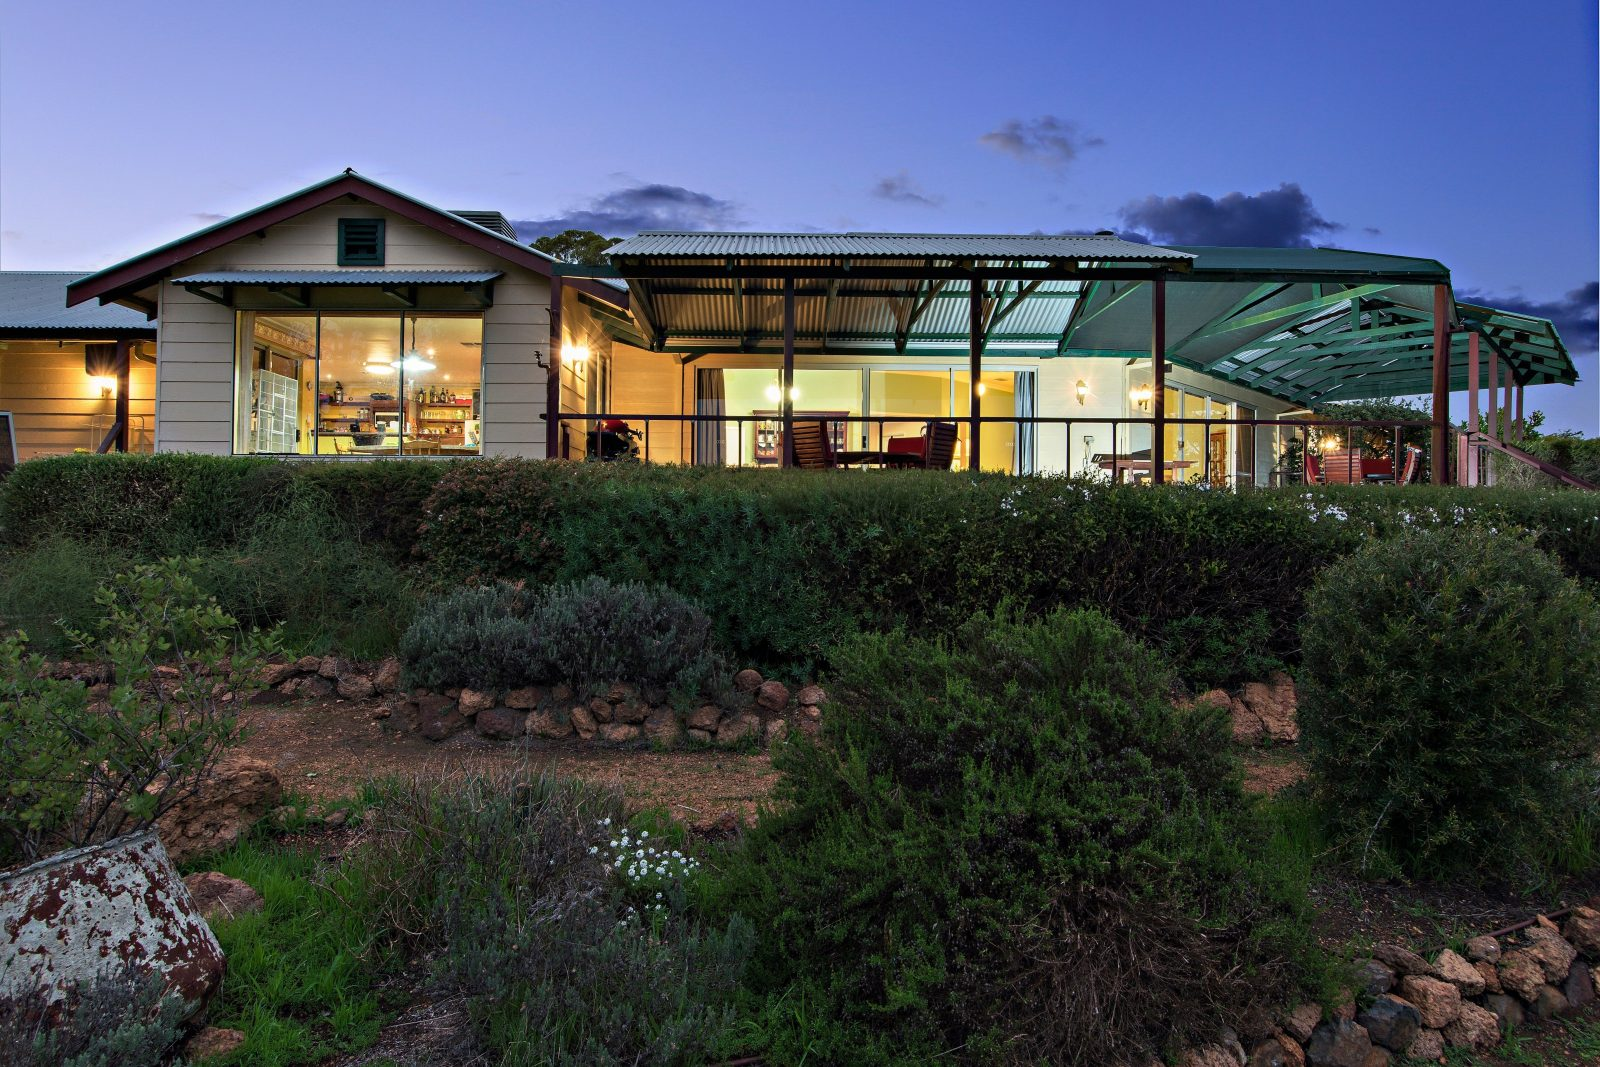 Shambhala Guesthouse, Kangaroo Valley, Western Australia